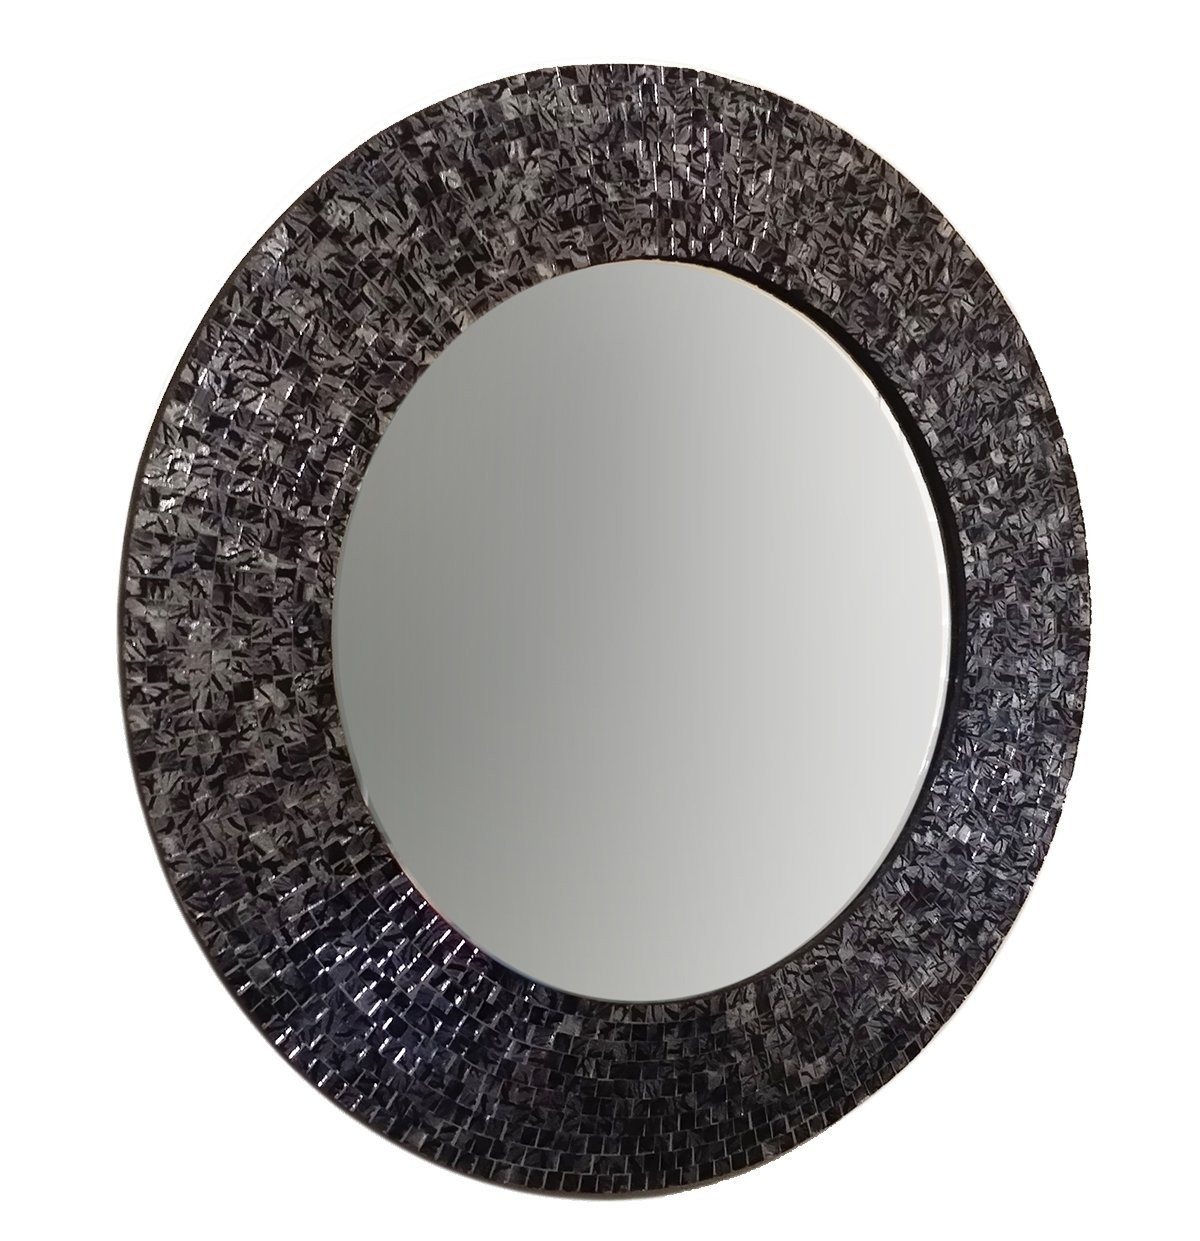 Buy 24 Blacksilver Metallic Traditional Mosaic Decorative Wall